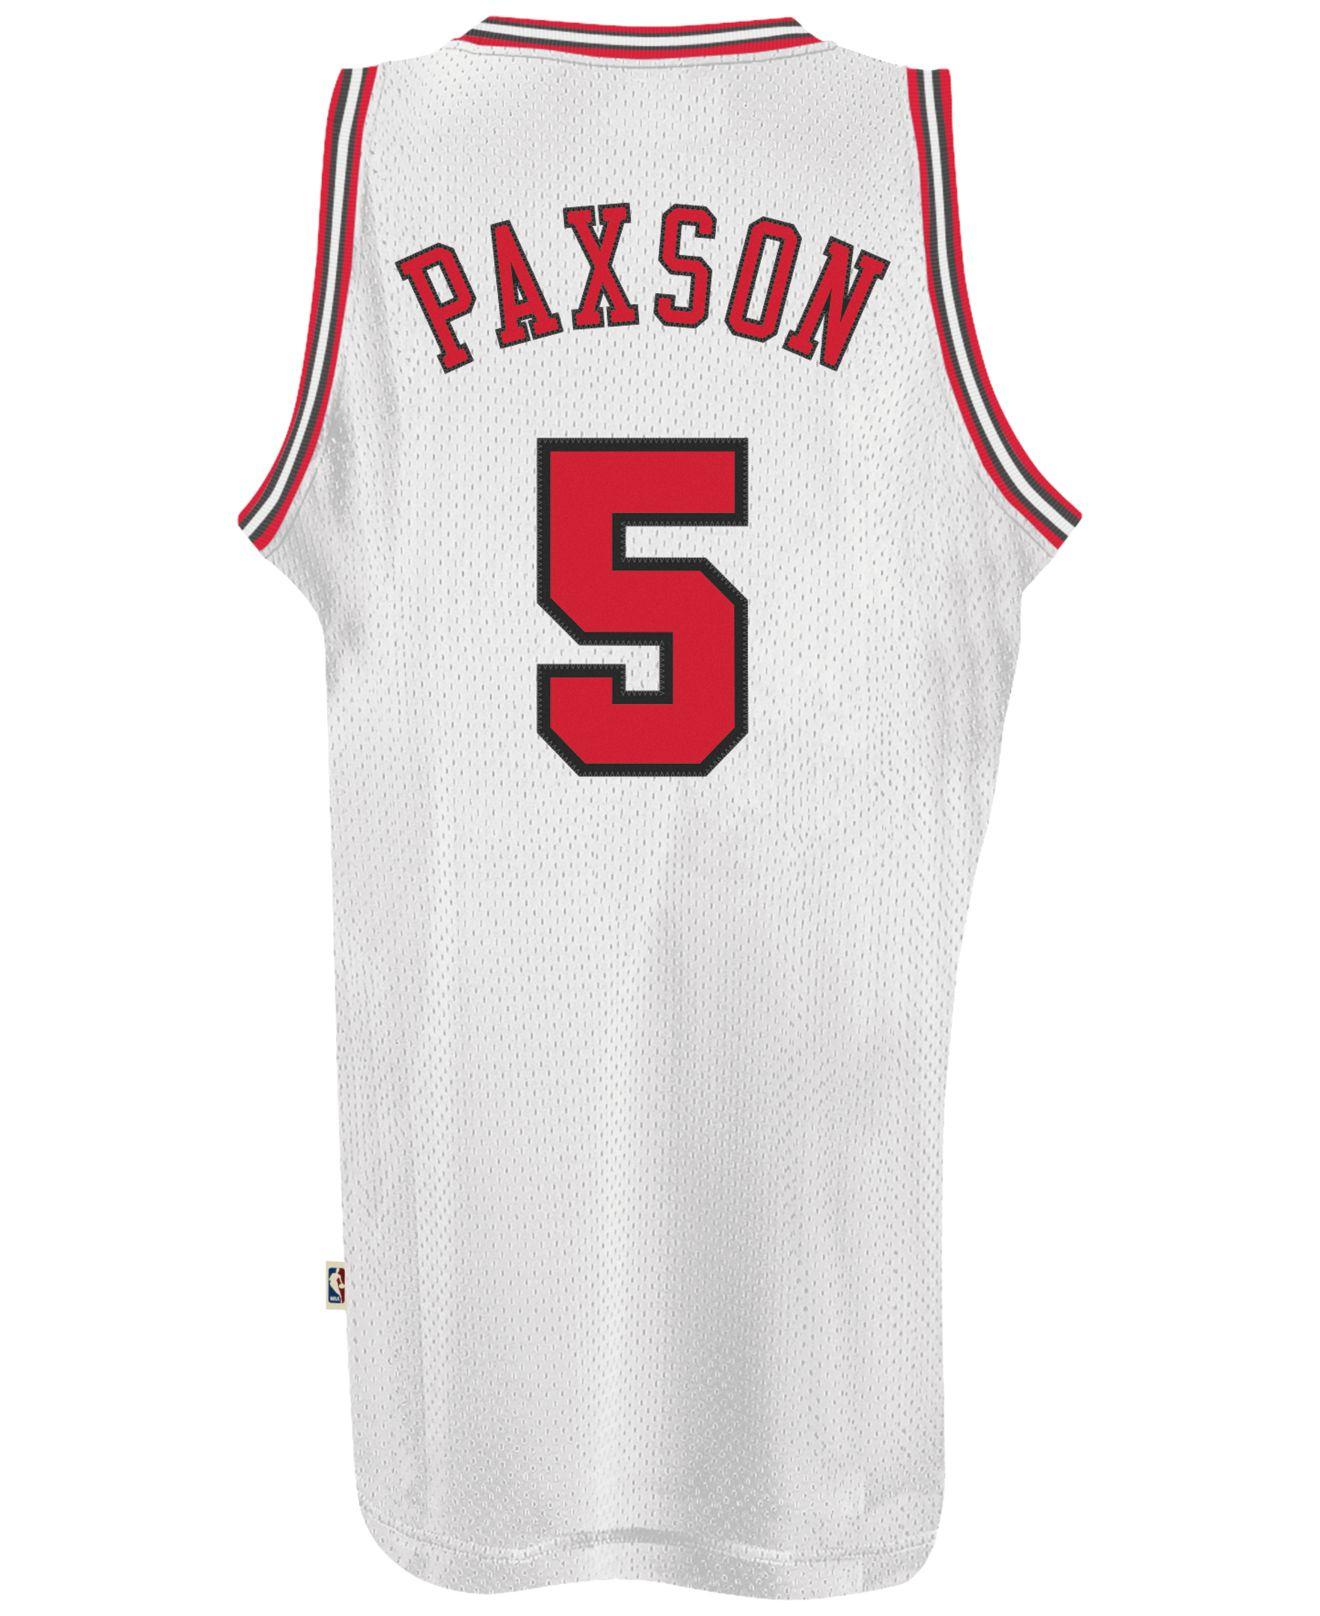 Lyst - adidas Men S John Paxson Chicago Bulls Retired Player ... 0af49b905